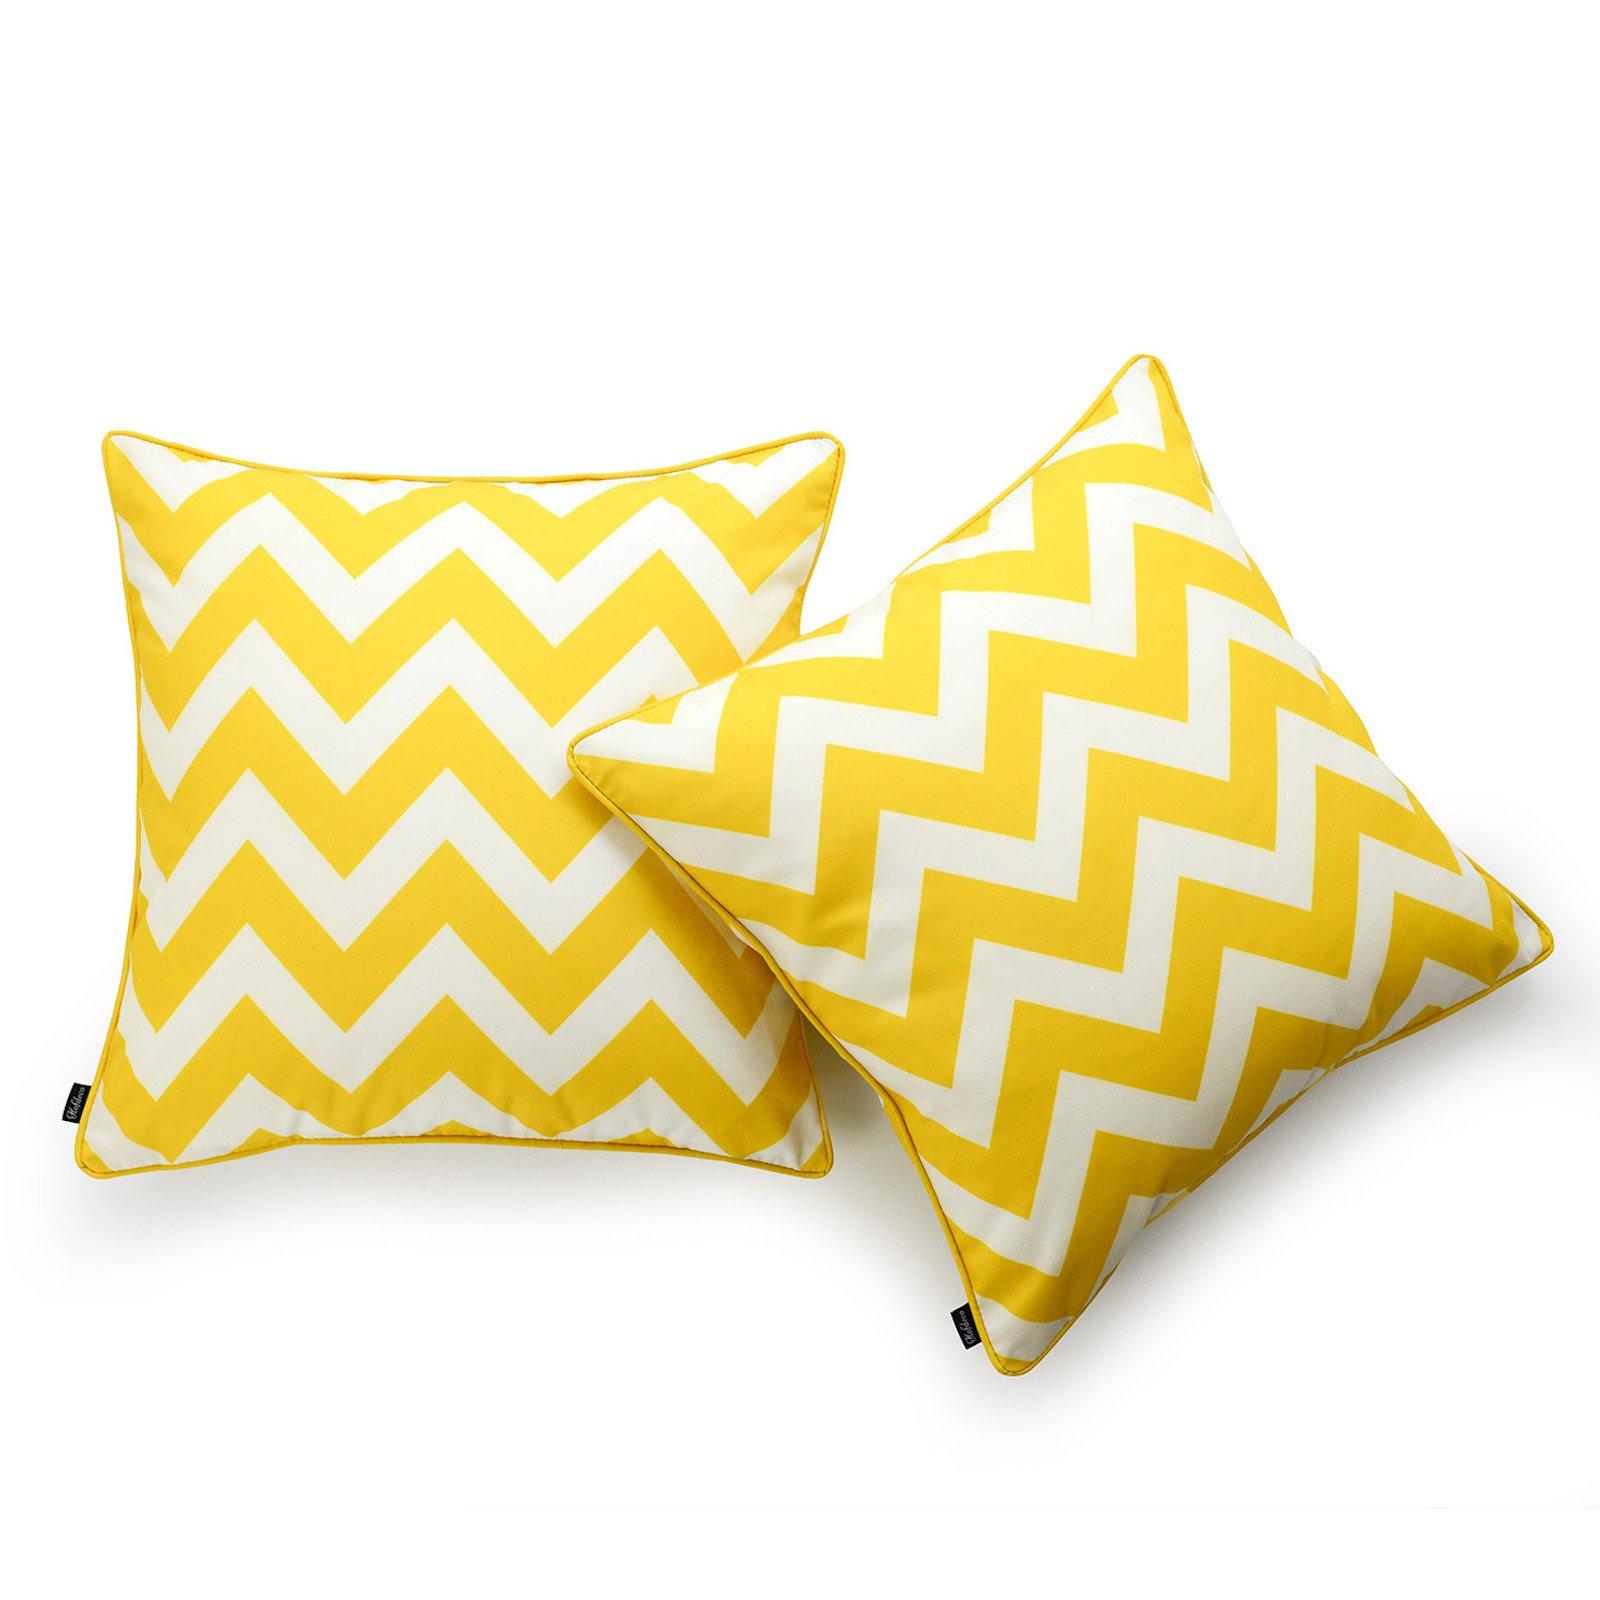 Hofdeco Decorative Throw Pillow Cover INDOOR OUTDOOR WATER RESISTANT Canvas Vibrant Yellow Zigzag Chevron 18''x18'' Set of 2